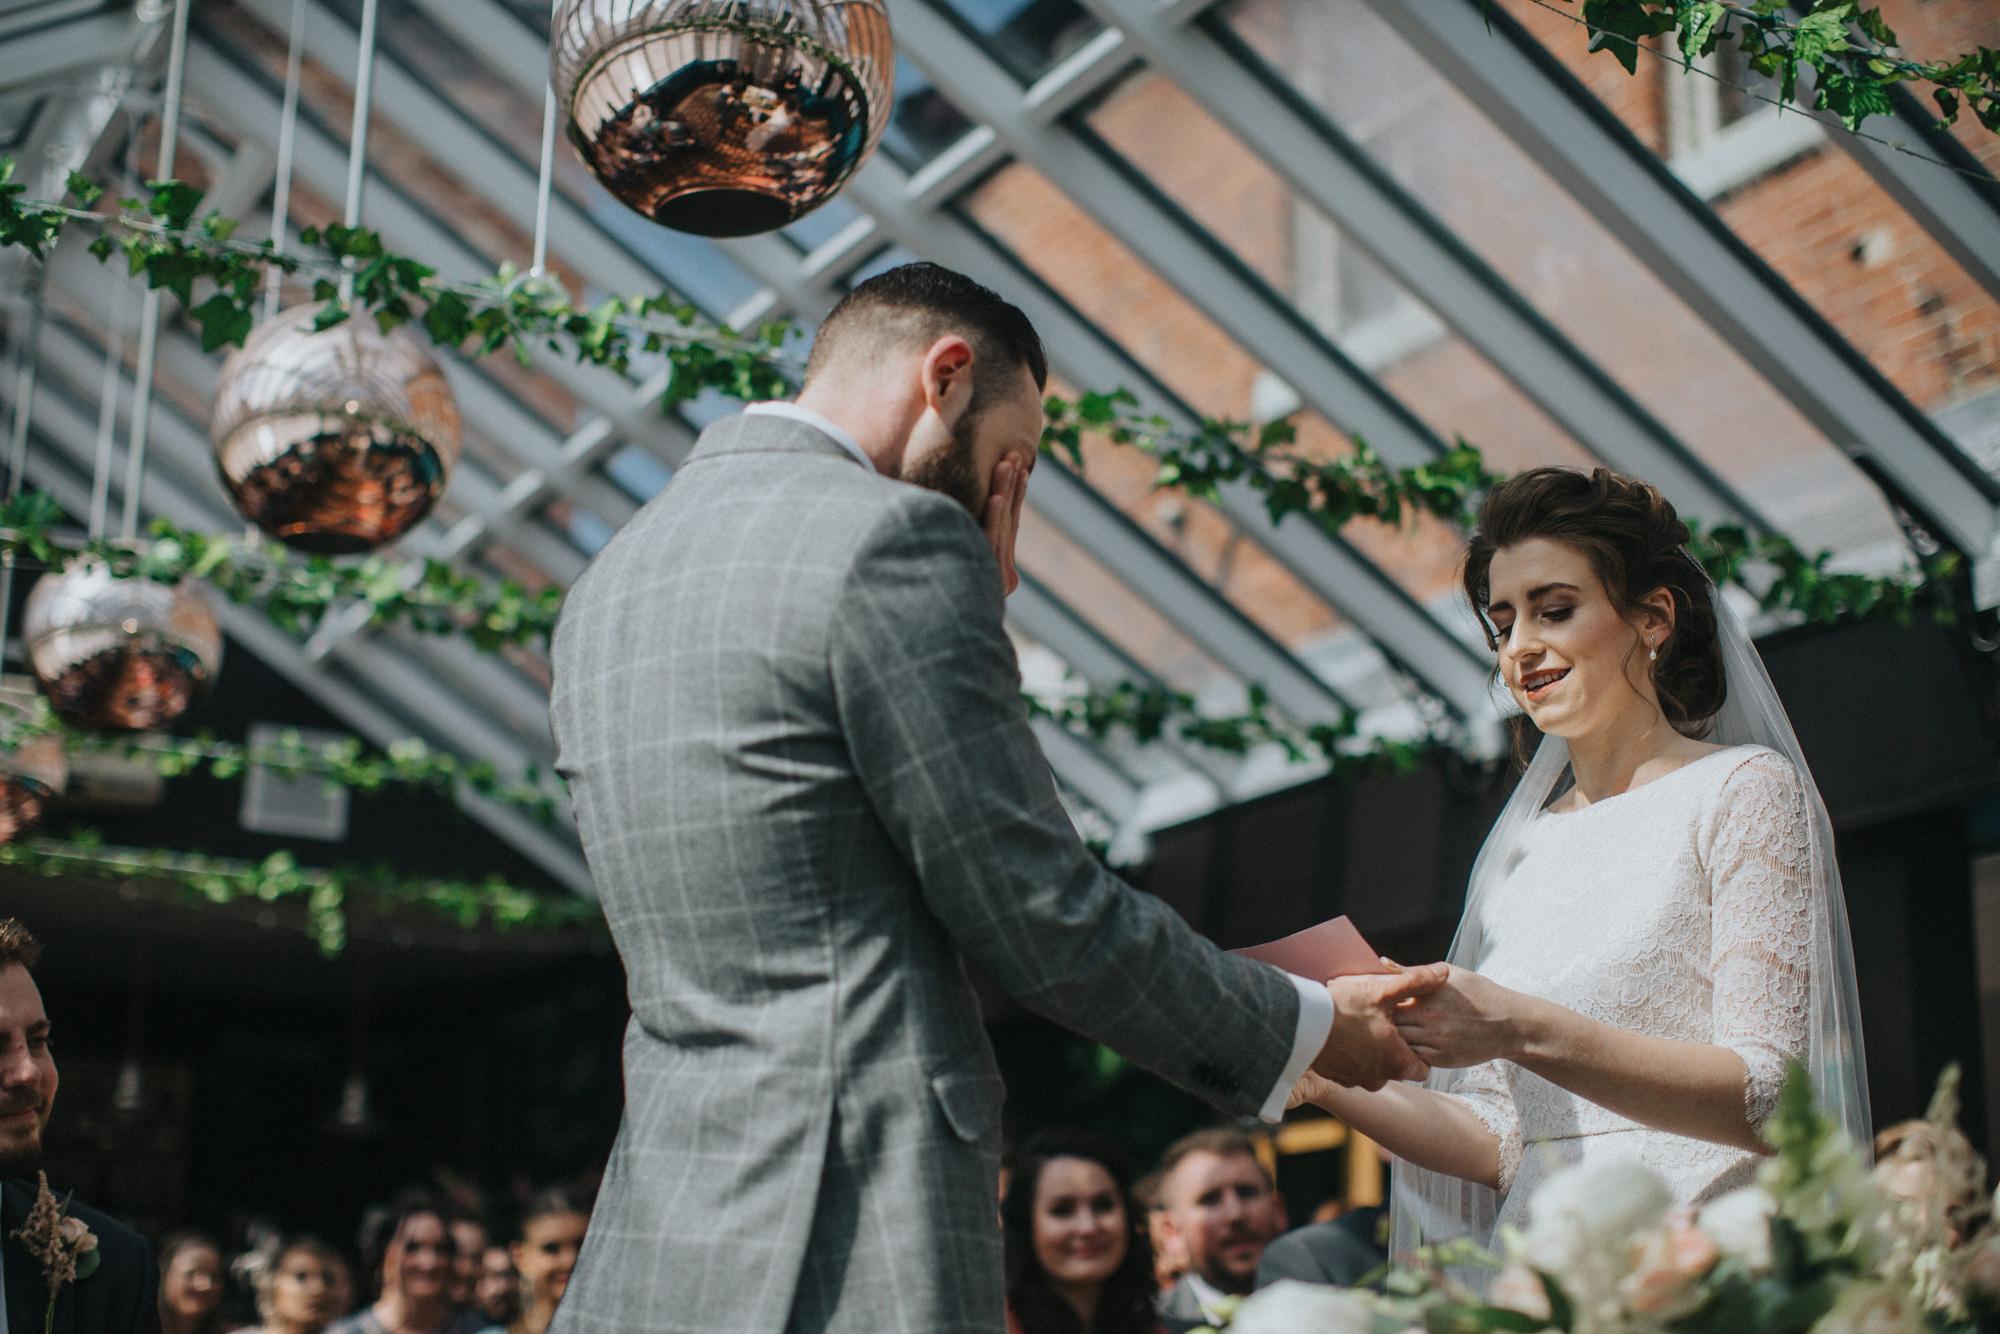 Kate-Beaumont-Lace-Flared-Dahlia-Gown-Leeds-Wedding-Bloom-Weddings-20.jpg